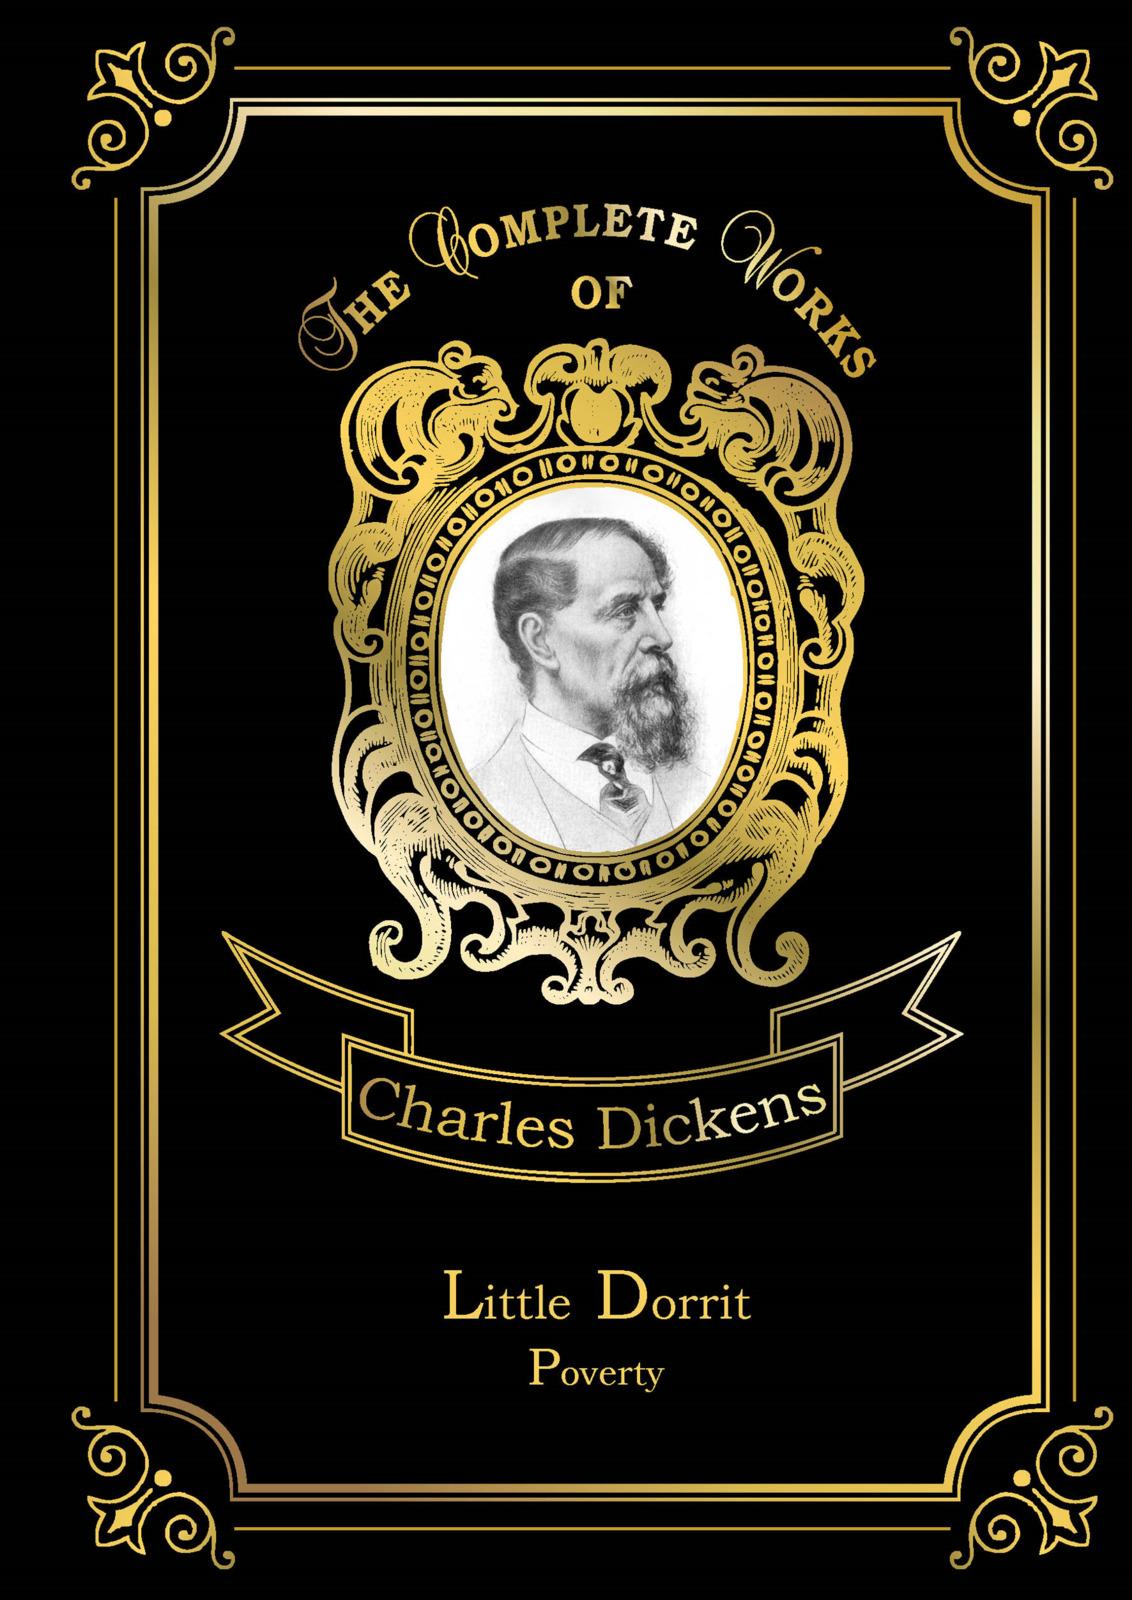 Charles Dickens Little Dorrit: Poverty the financier